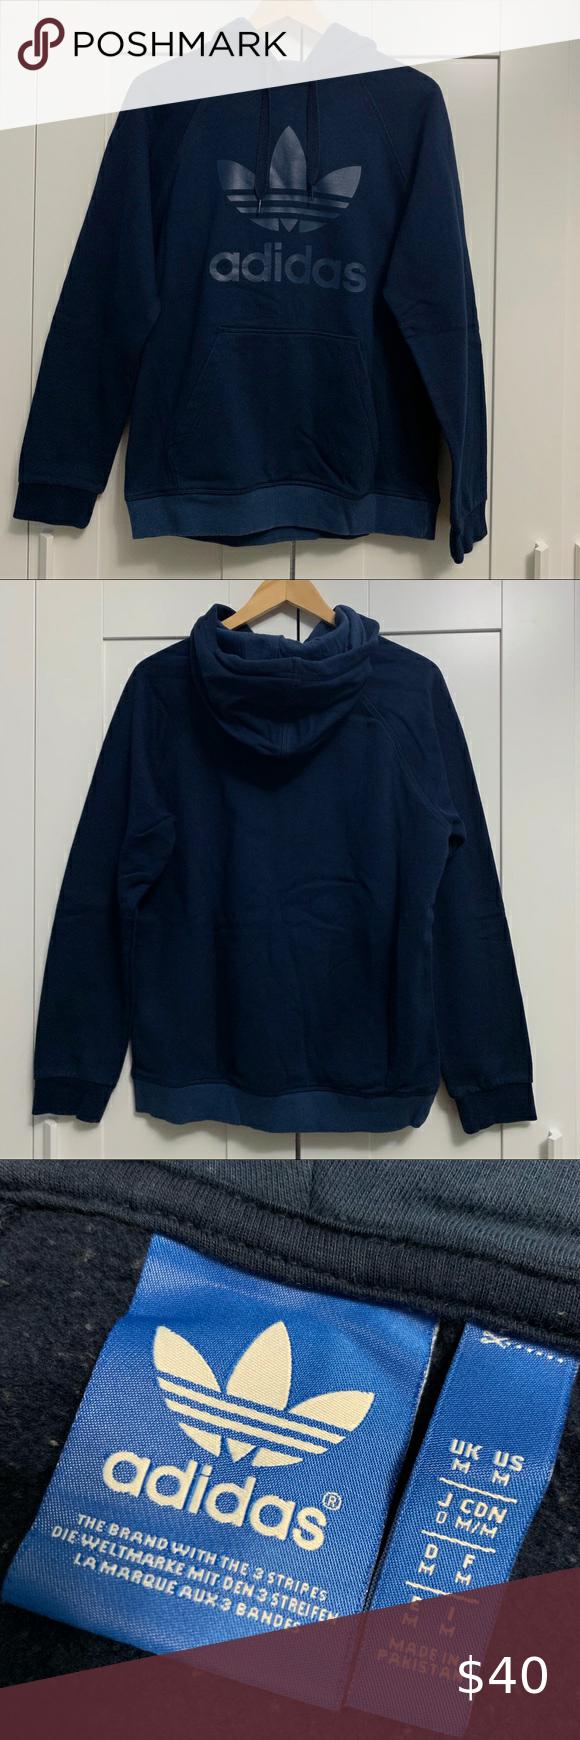 Adidas Men S Navy Blue Trefoil Hoodie Adidas Men Sweatshirt Shirt Hoodies [ 1740 x 580 Pixel ]